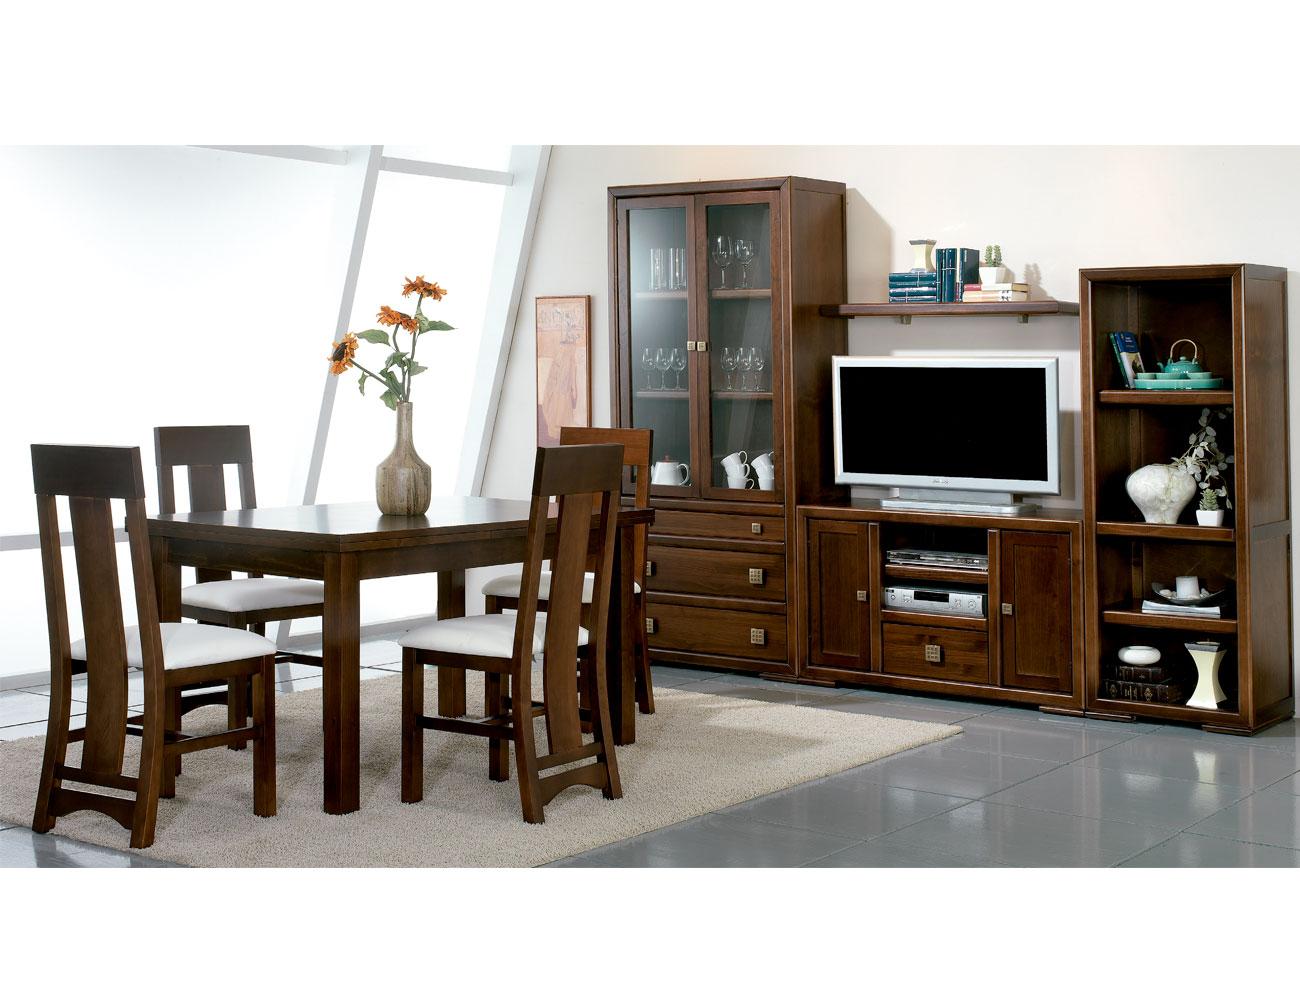 Composicion12 mueble salon comedor mesa silla3